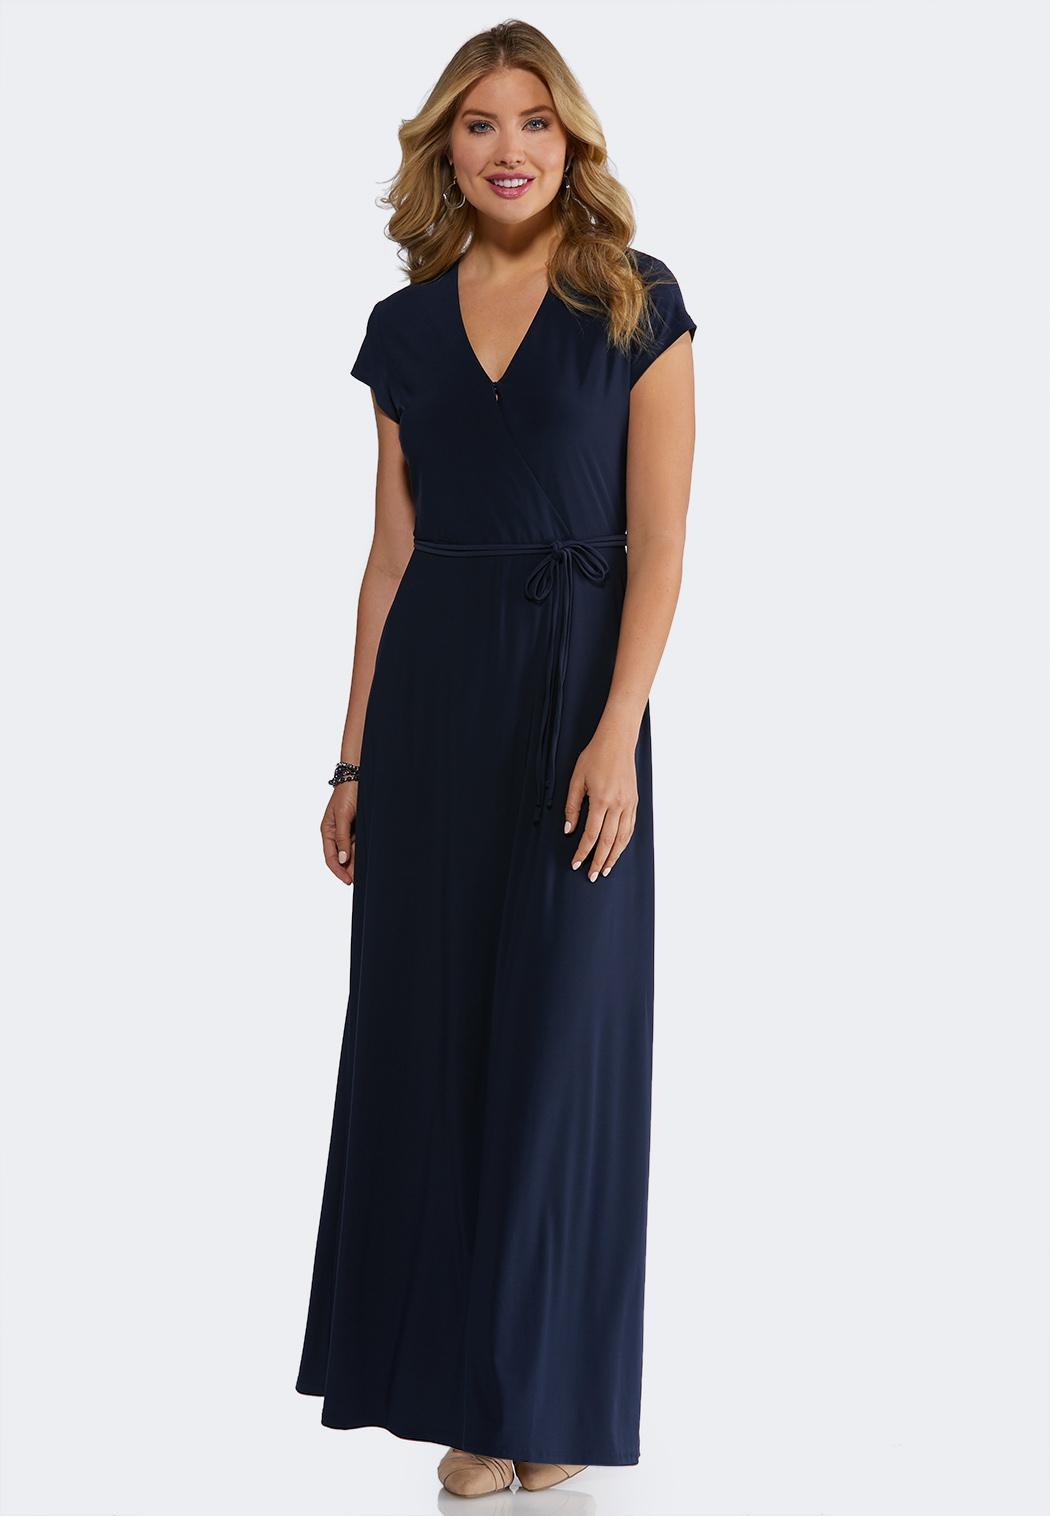 734327d95ca Petite Navy Tie Waist Maxi Dress Junior Misses Cato Fashions